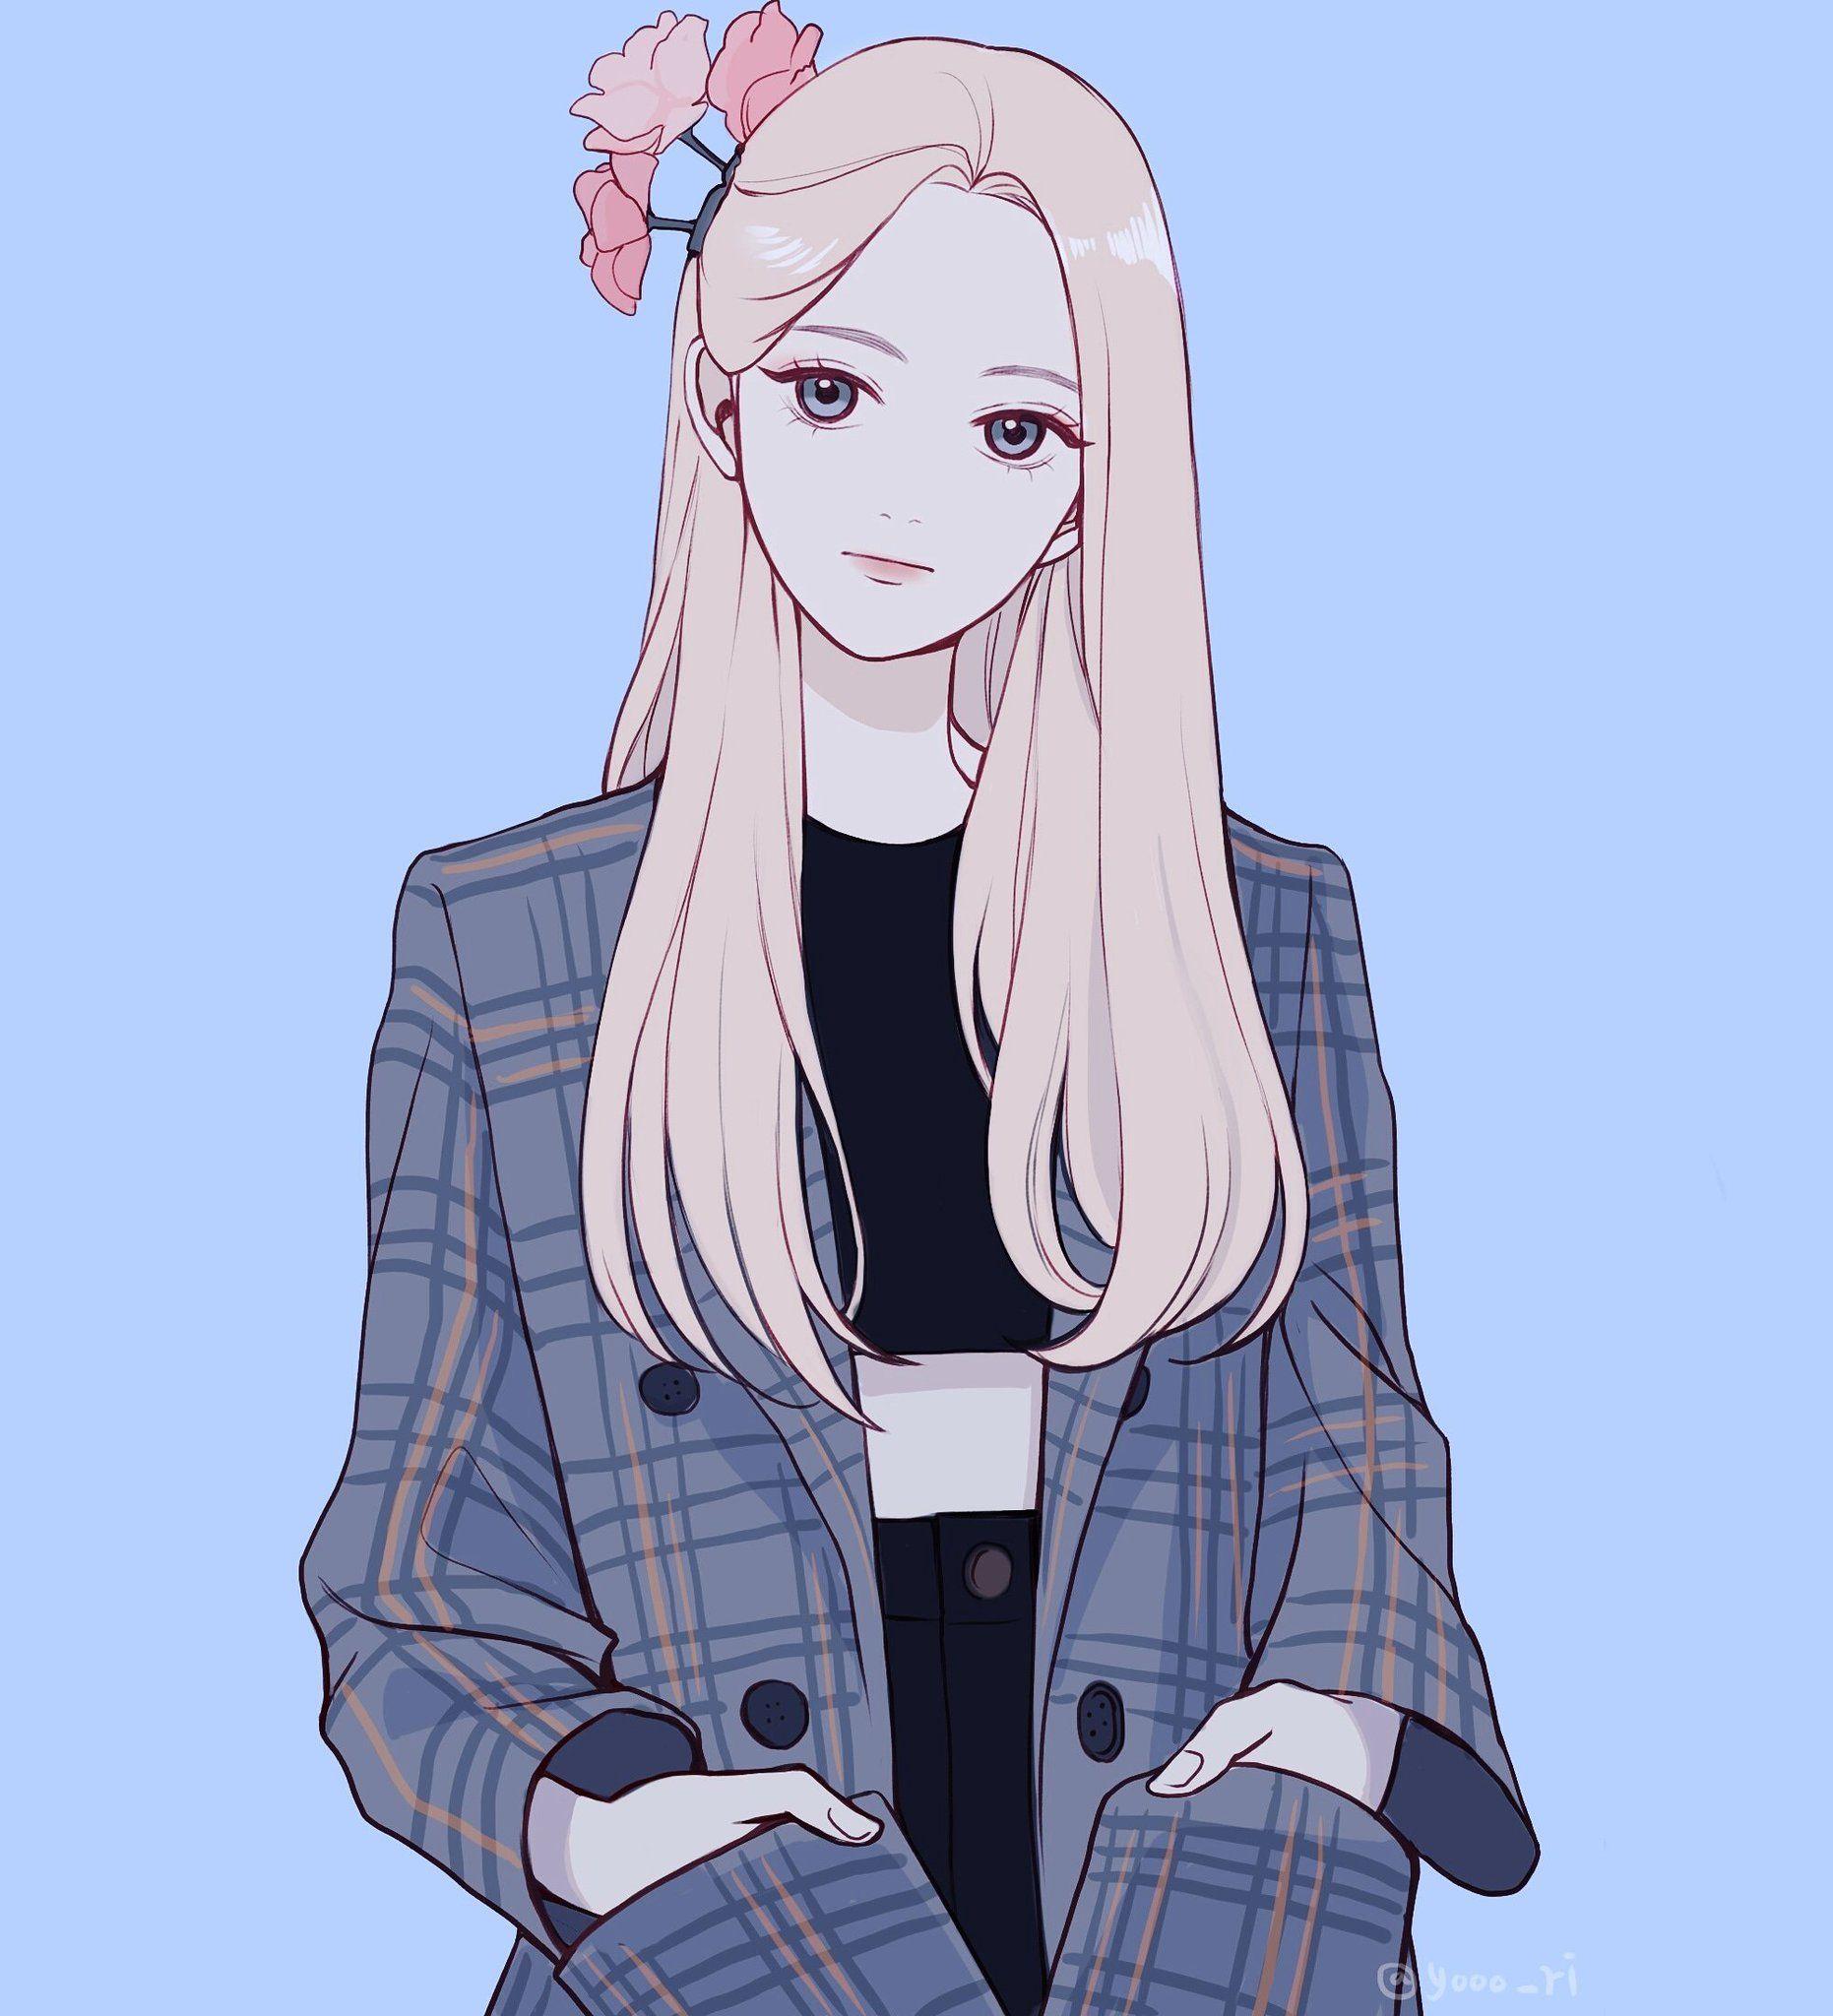 yori on Anime art girl, Character art, Anime art